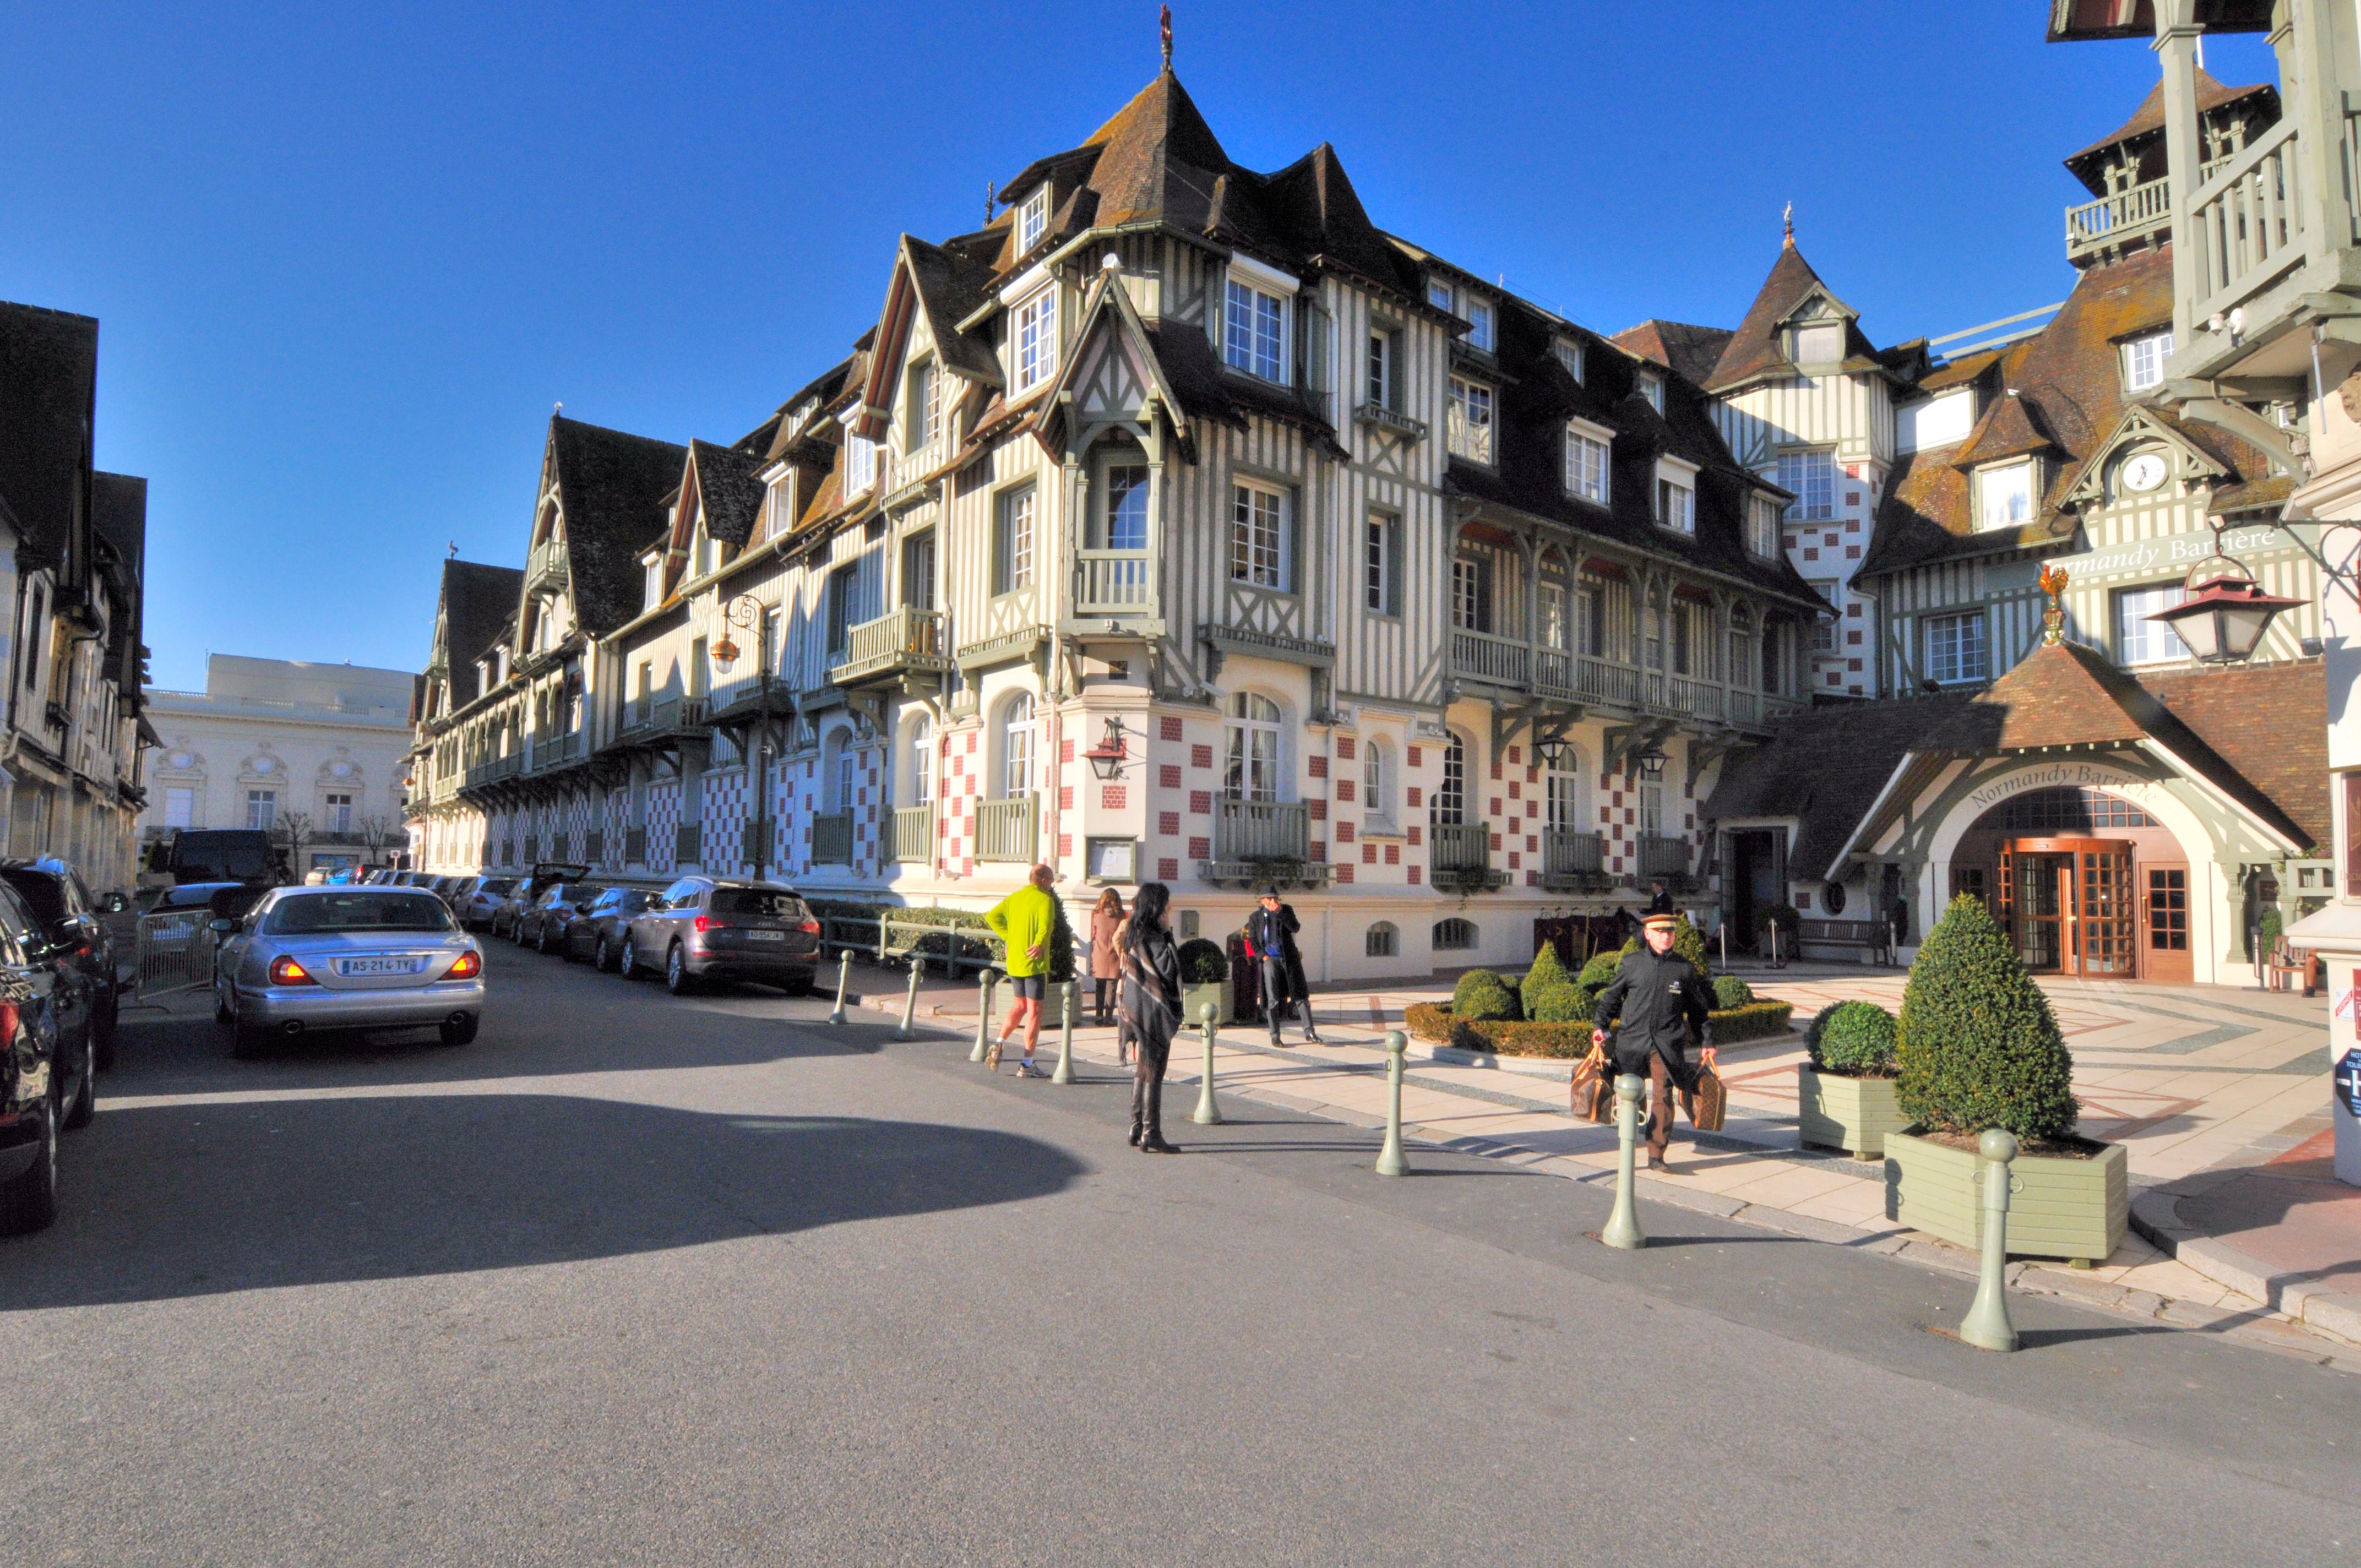 File:Normandy Barrière Deauville 8014.JPG - Wikimedia Commons